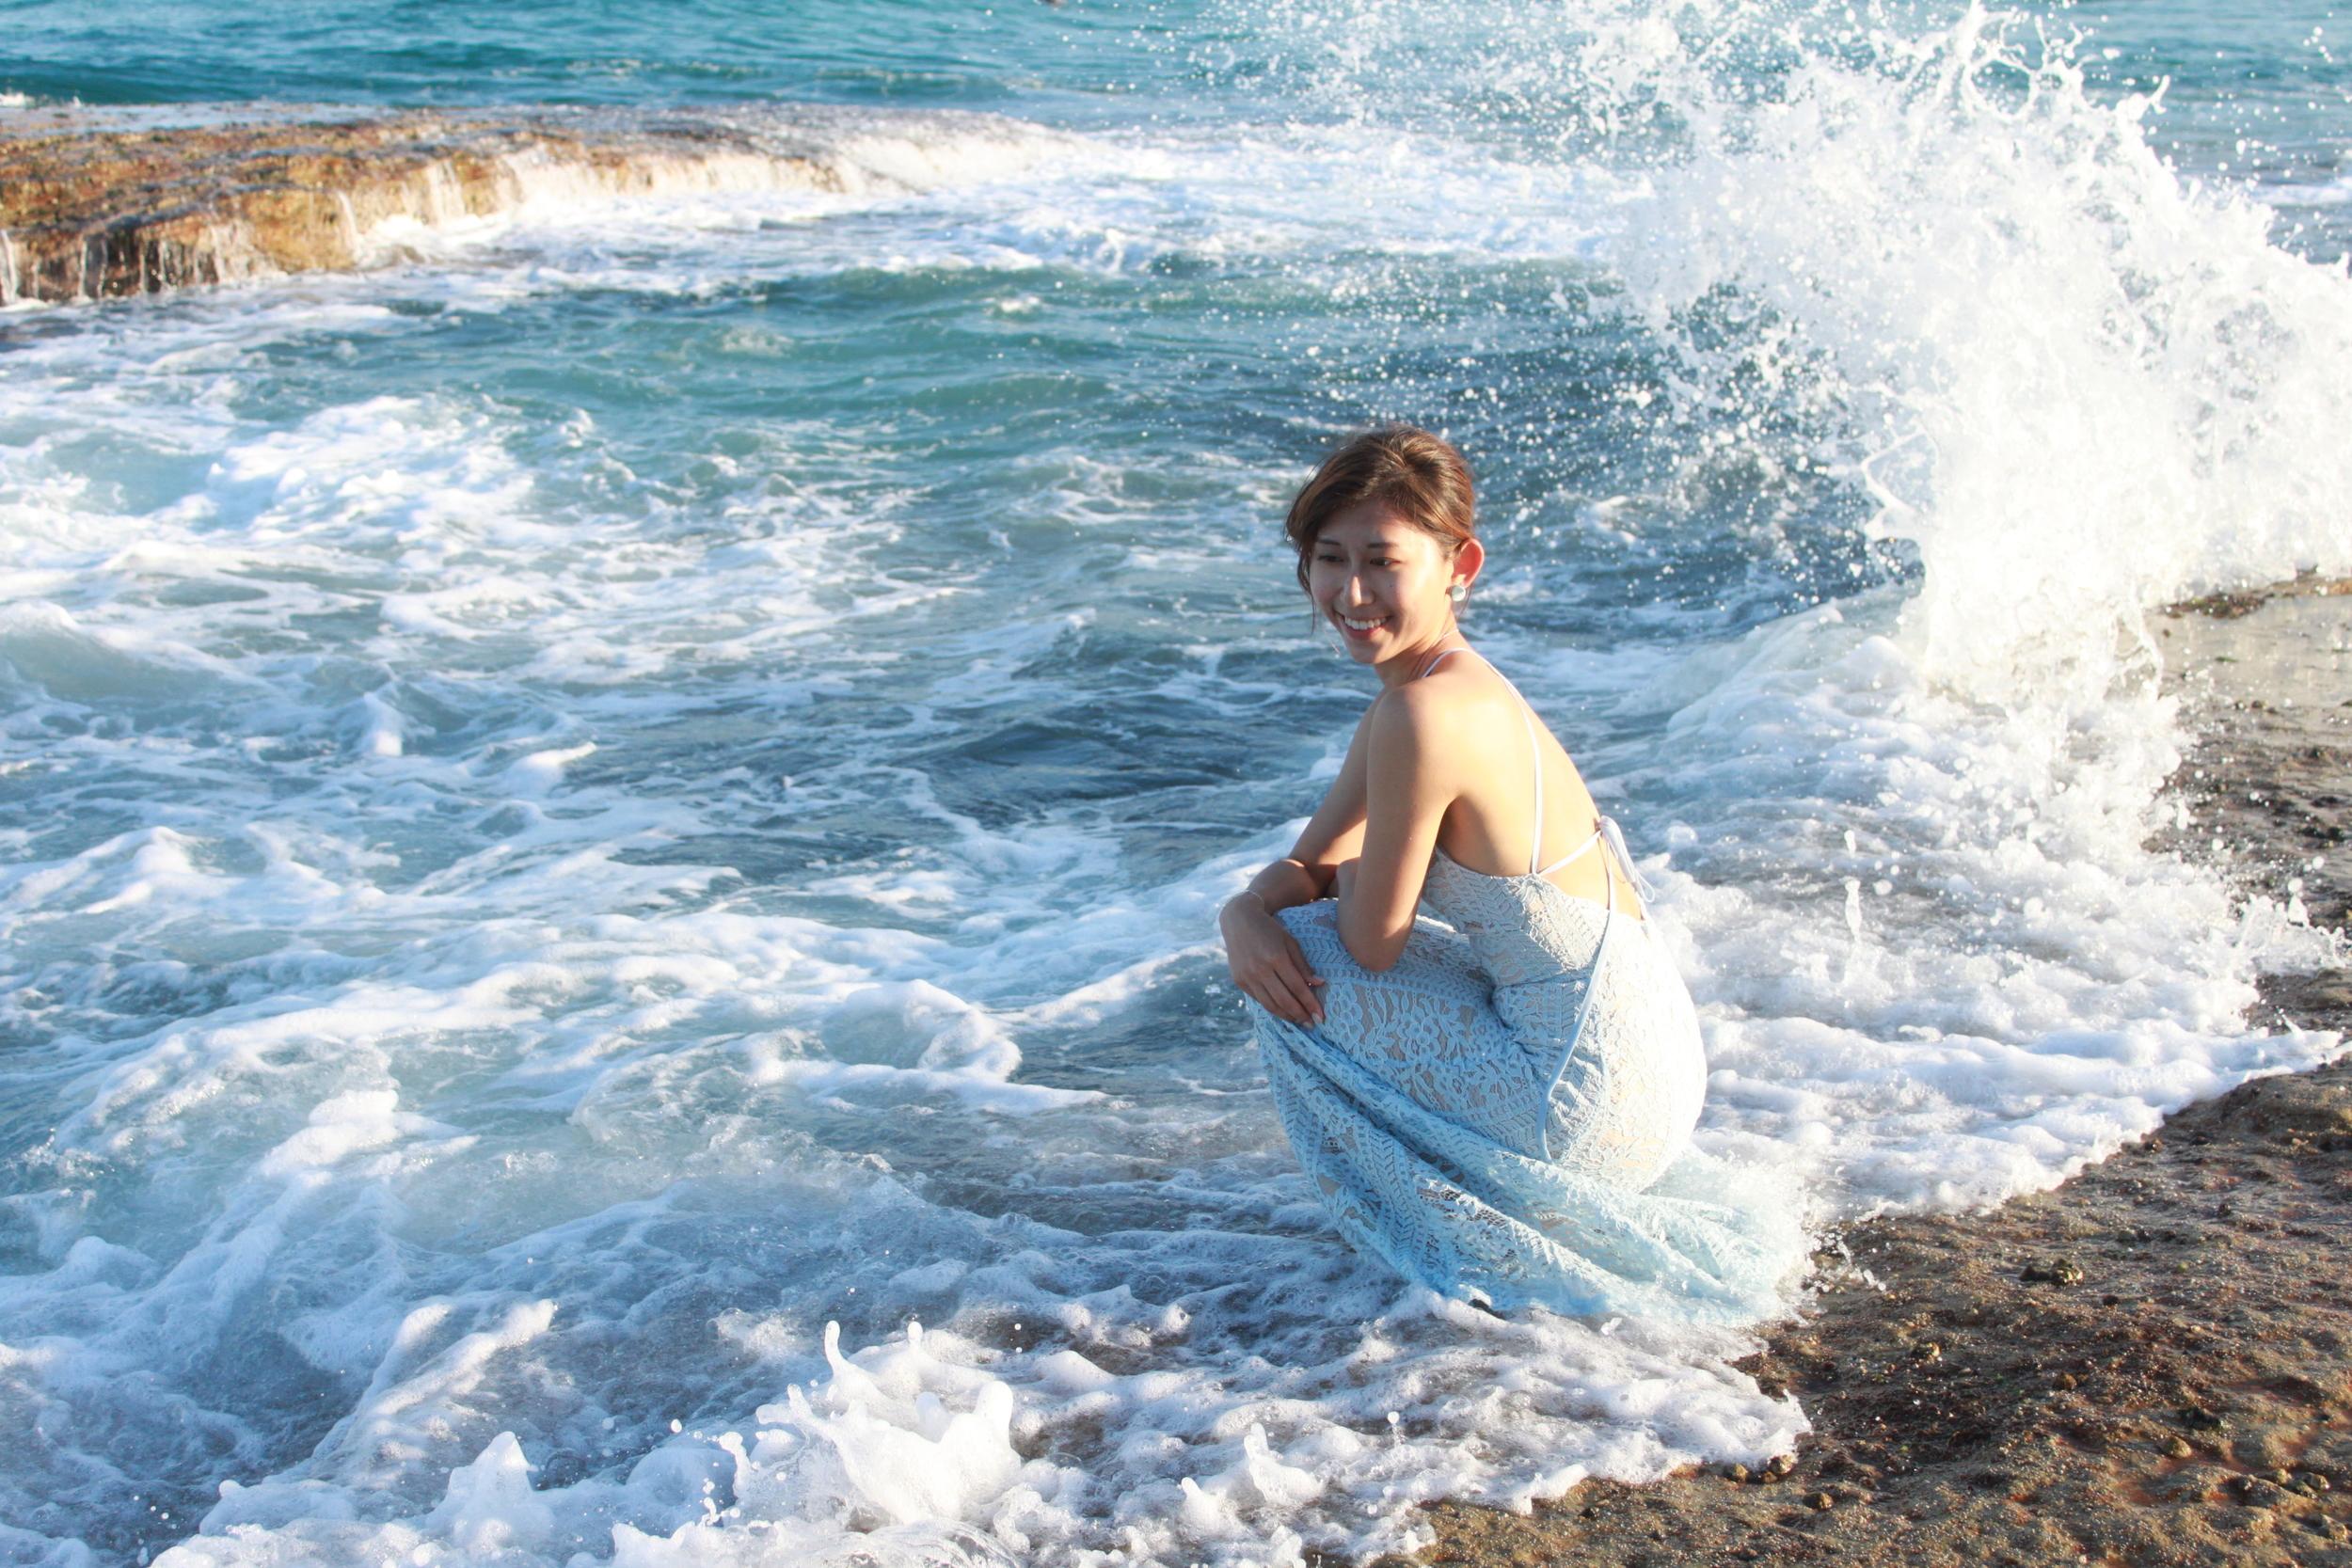 Wearing:  Swan by VGY blue full lace maxi dress / DearPostman Under the Same Sky earrings (coming out soon)